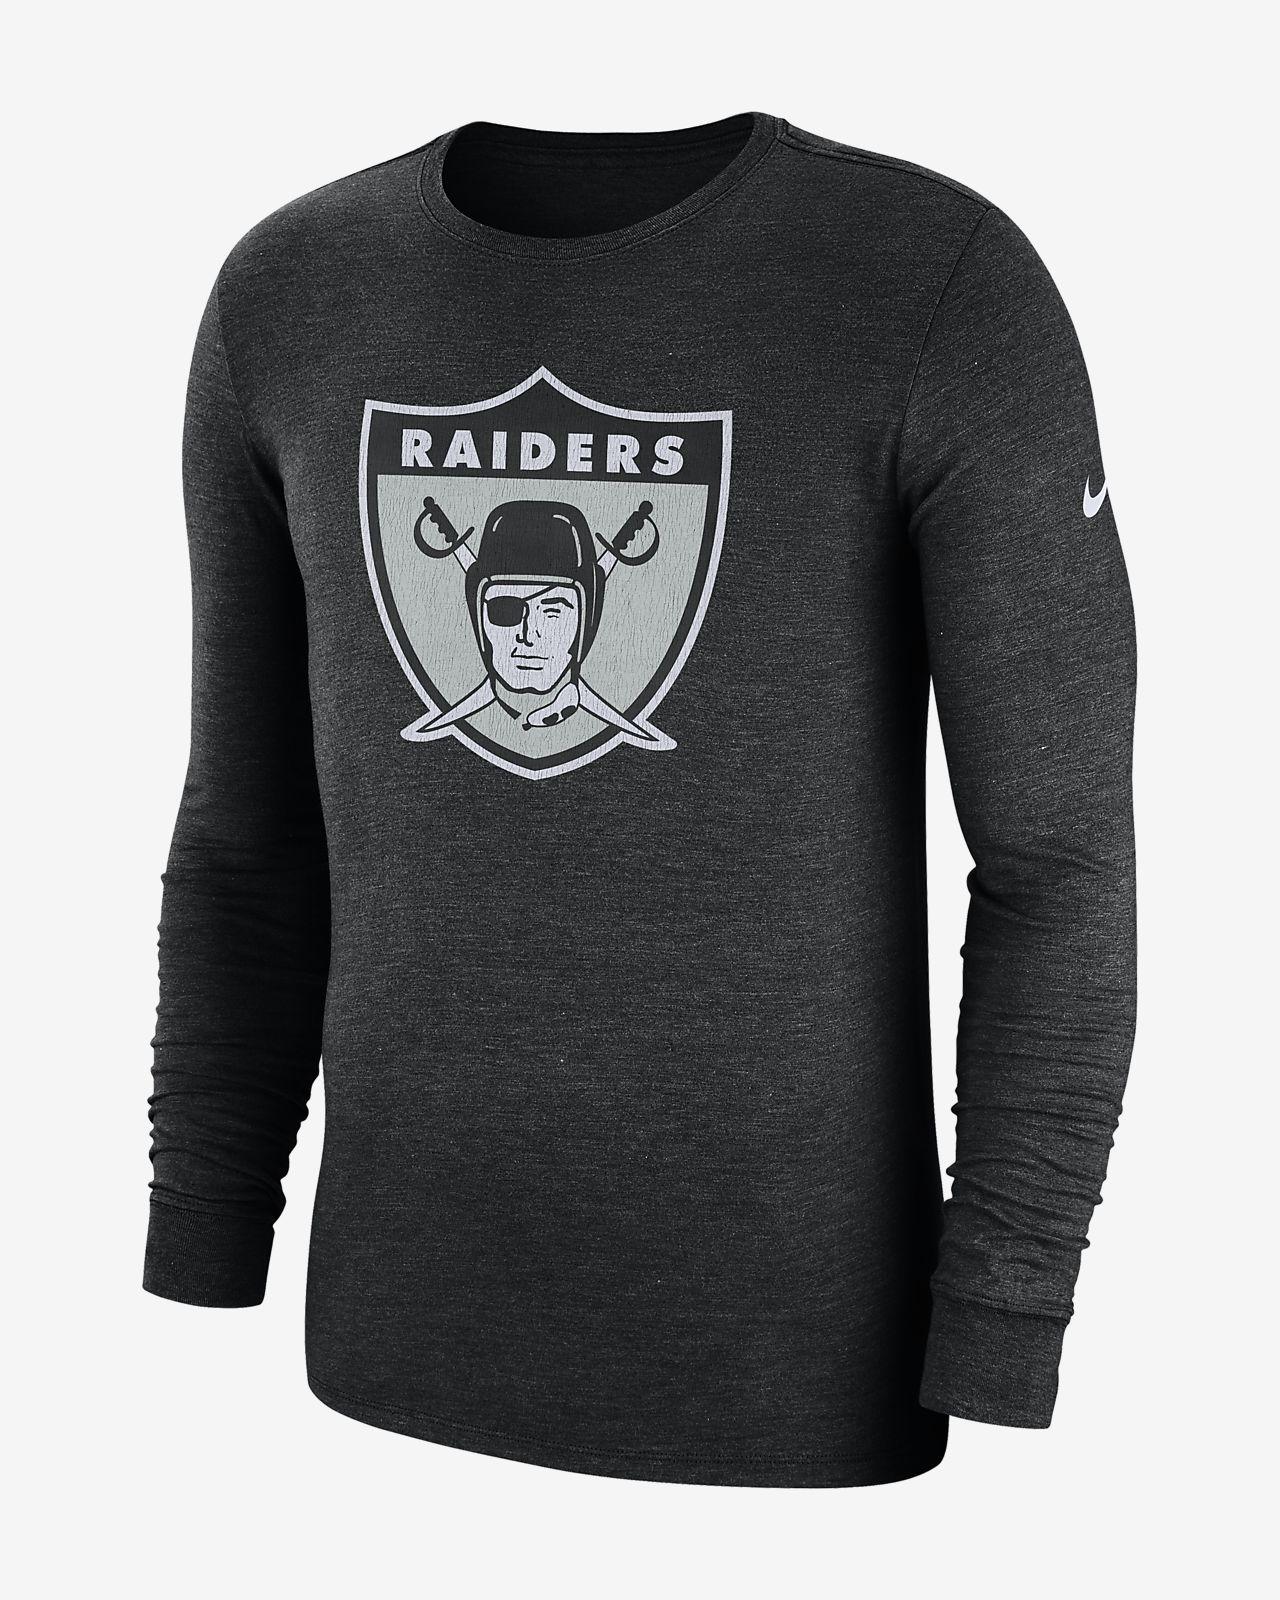 premium selection c6575 3823d Nike (NFL Raiders) Men's Tri-Blend Long-Sleeve T-Shirt